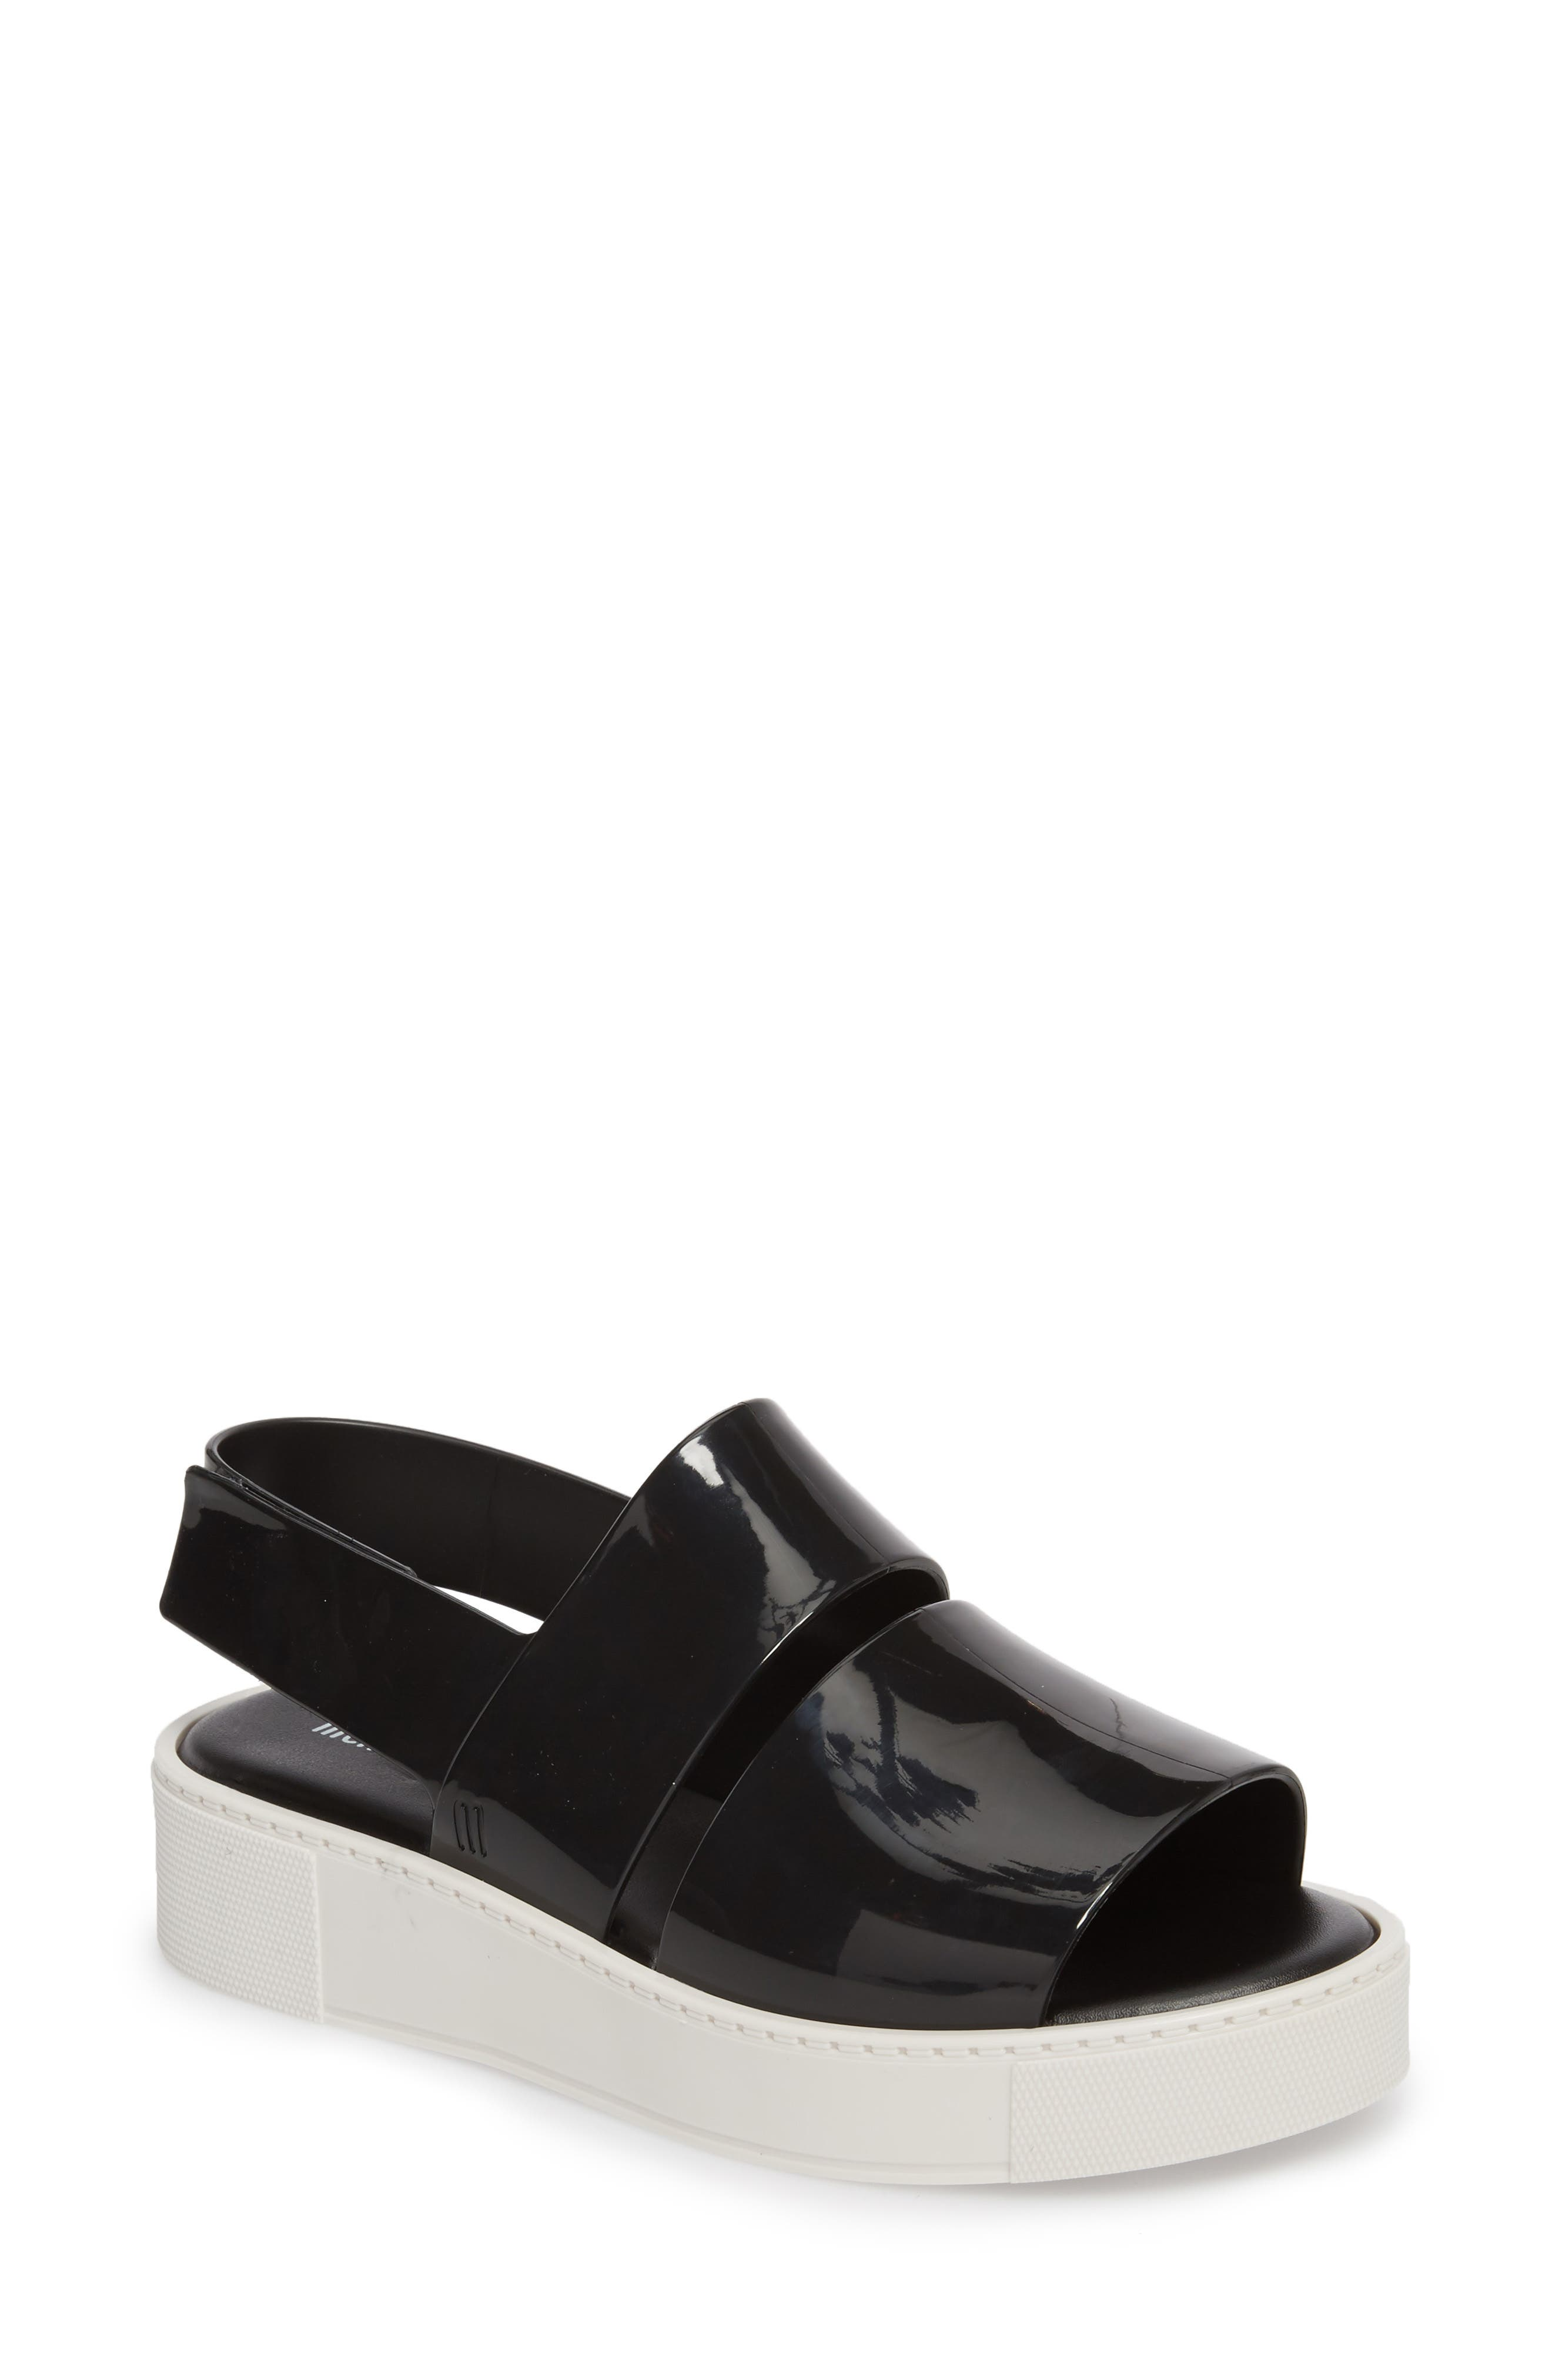 Soho Platform Sandal,                             Main thumbnail 1, color,